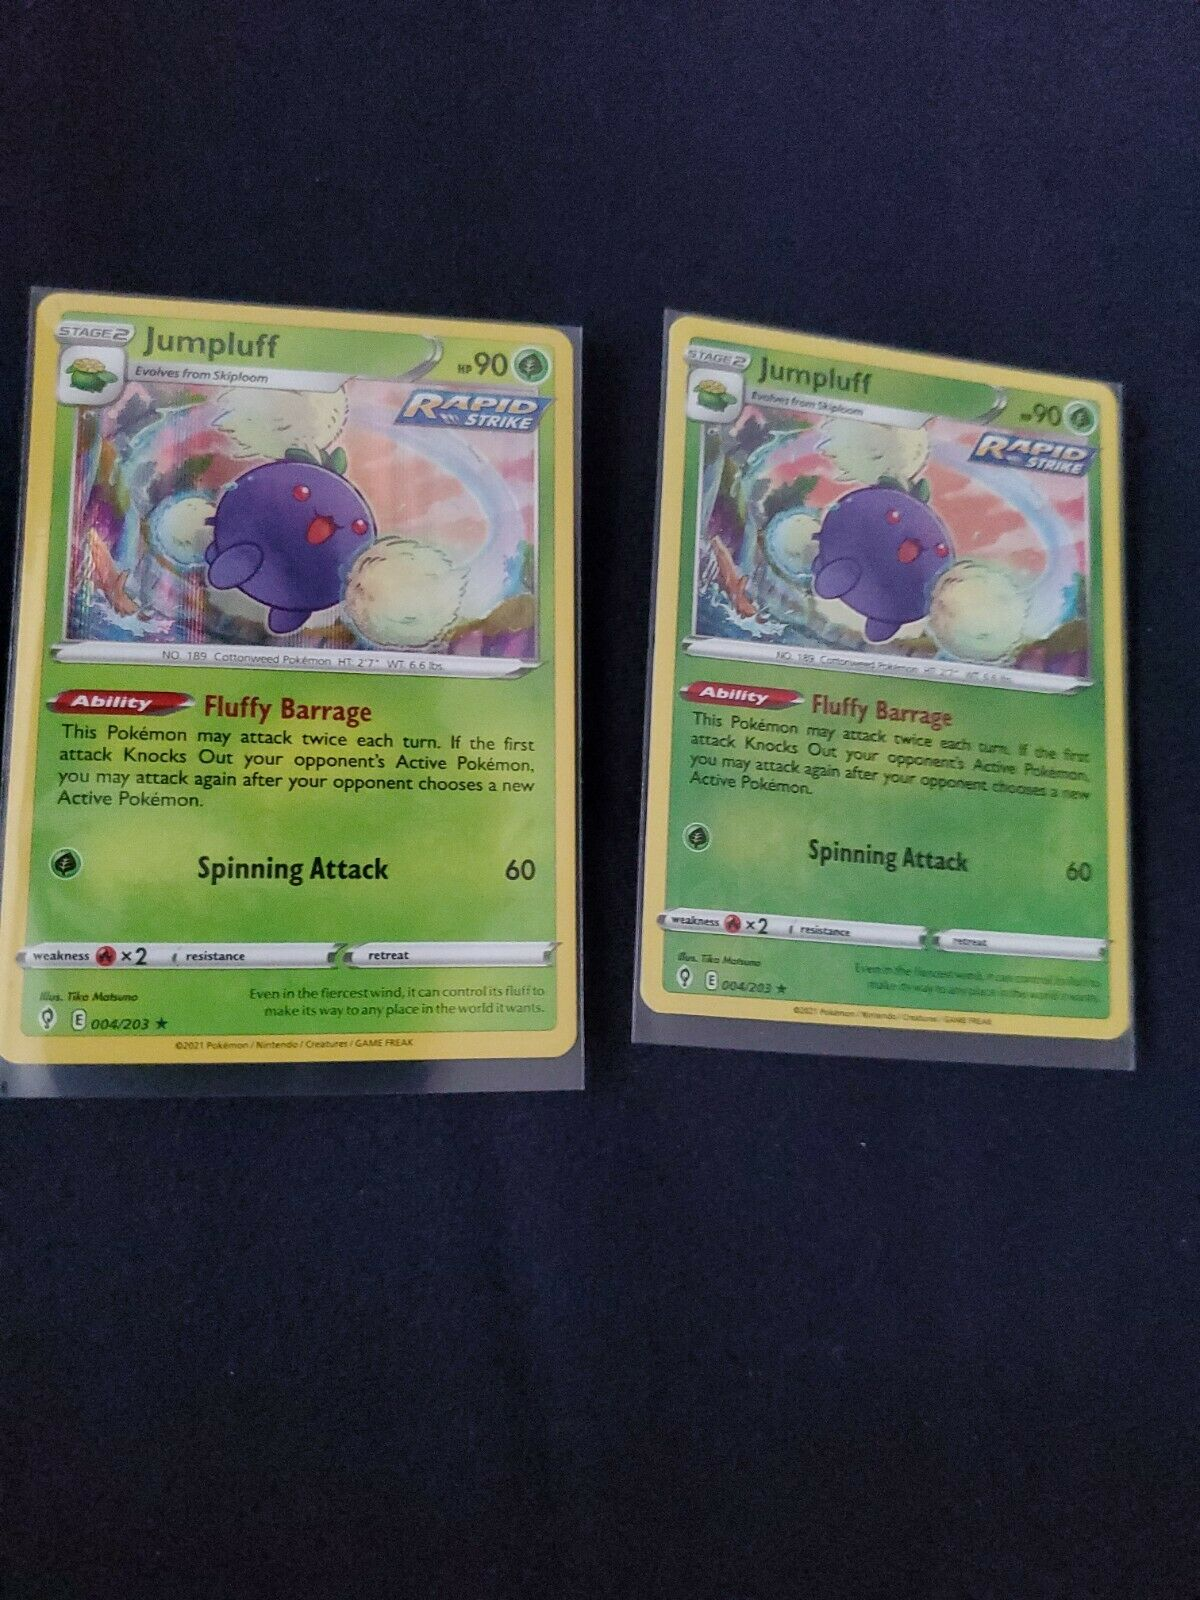 Pokemon - Jumpluff - Evolving Skies - 004/203 - Reverse Holo Rare & Holo Rare